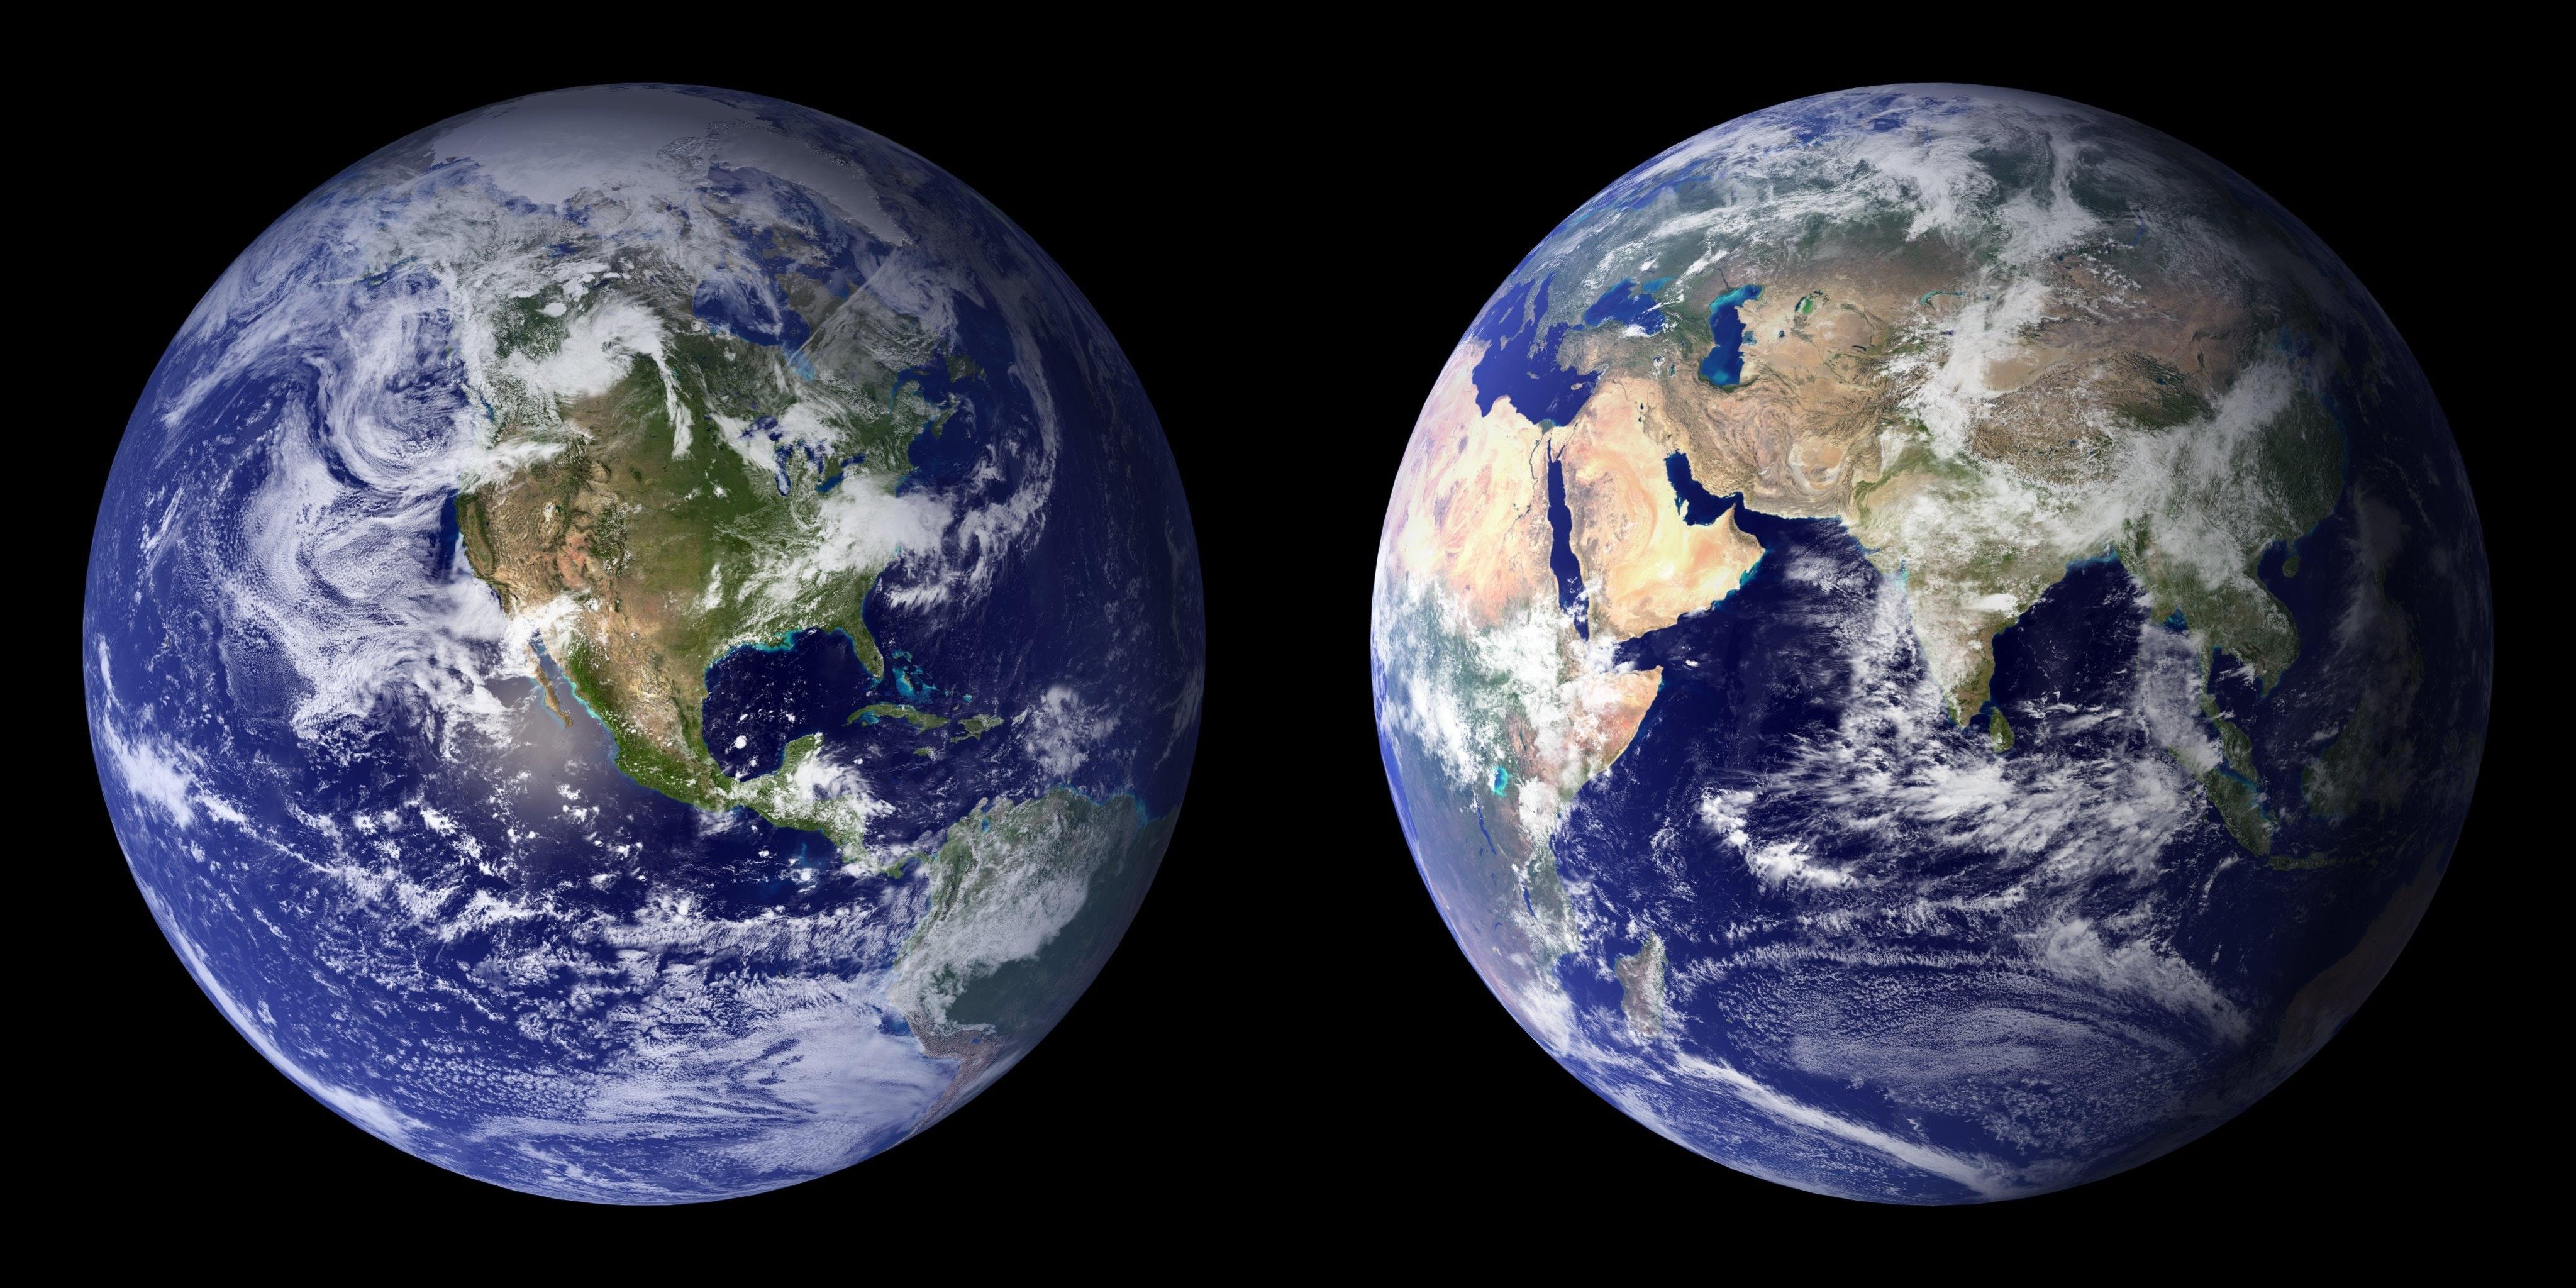 continents-earth-globe-41950.jpg